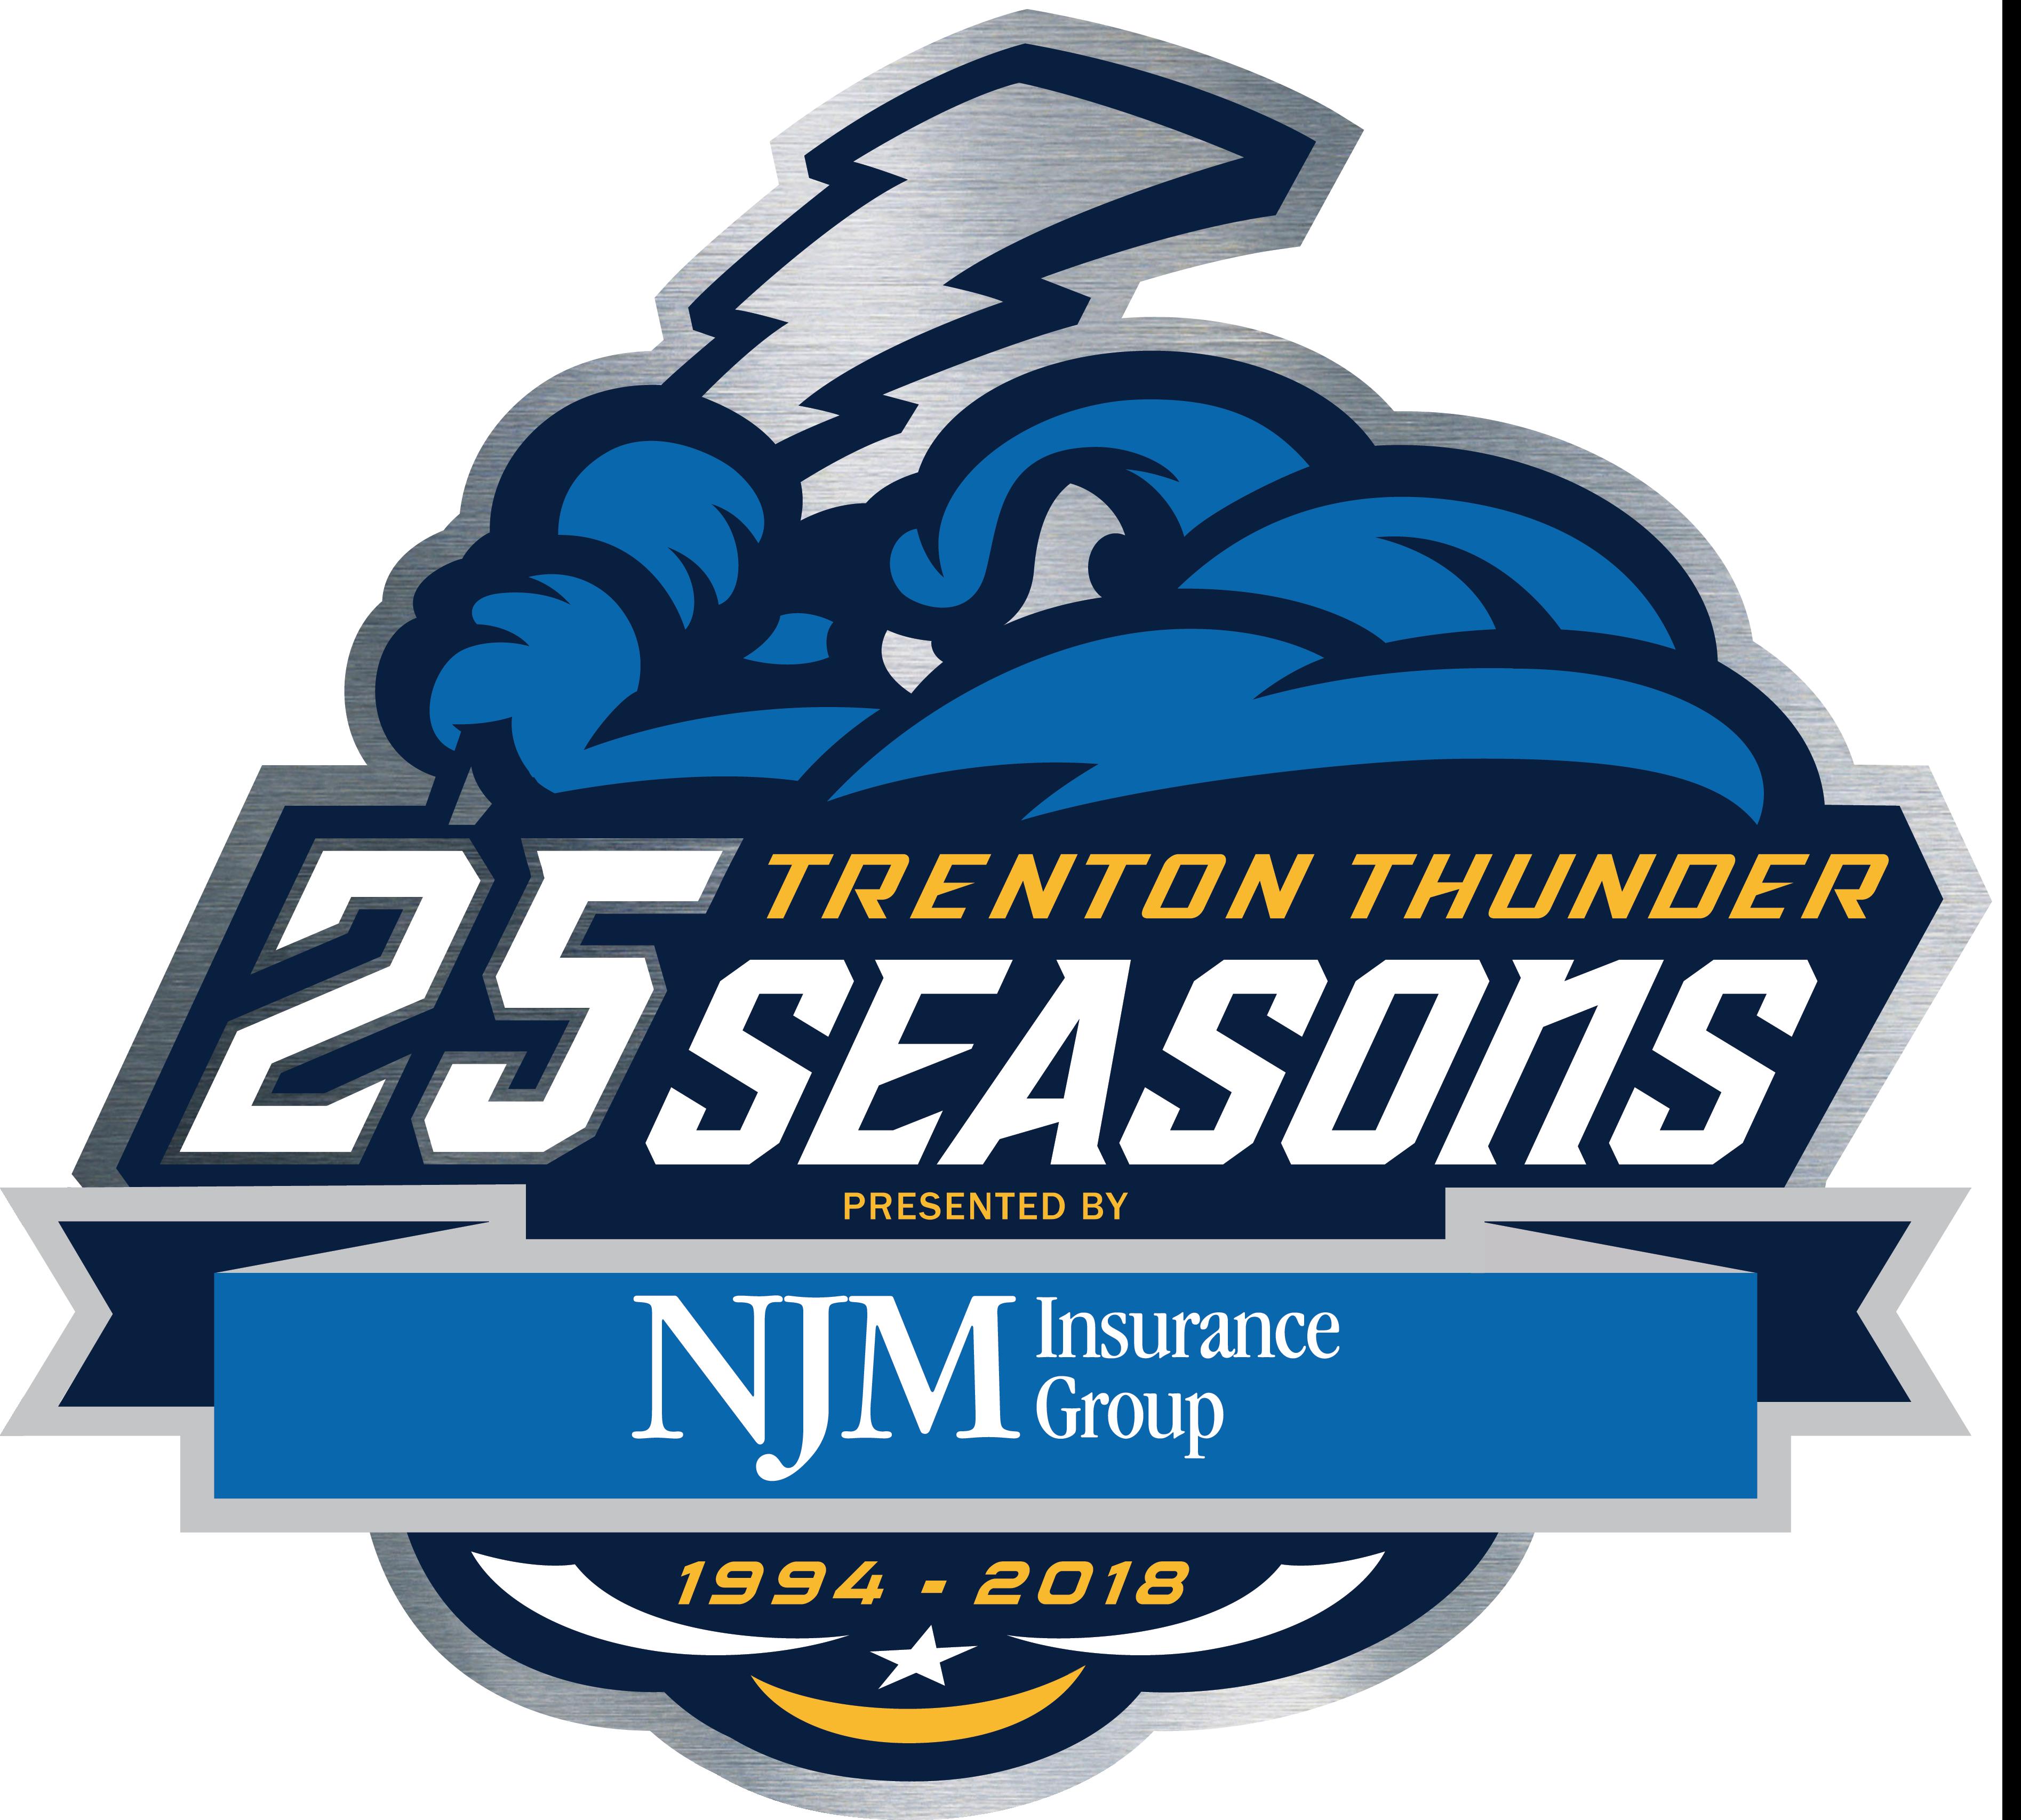 Trenton Thunder ARM & HAMMER Park.